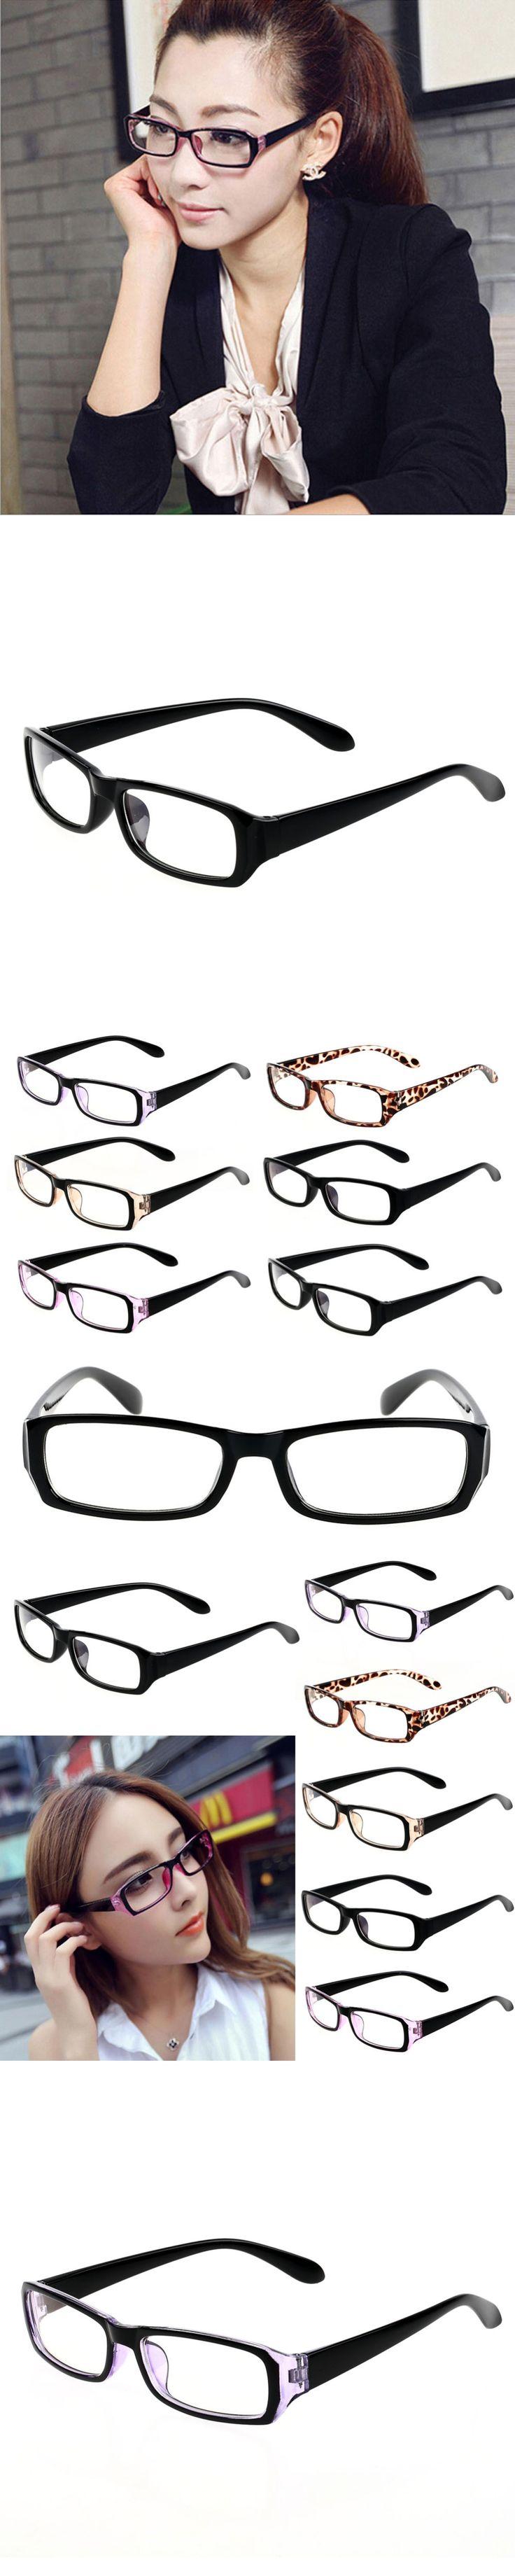 Fashion Men Women Radiation protection Glasses Computer Eyeglasses Frame anti-fatigue goggles Blue Film Anti-UV Plain mirror Y3